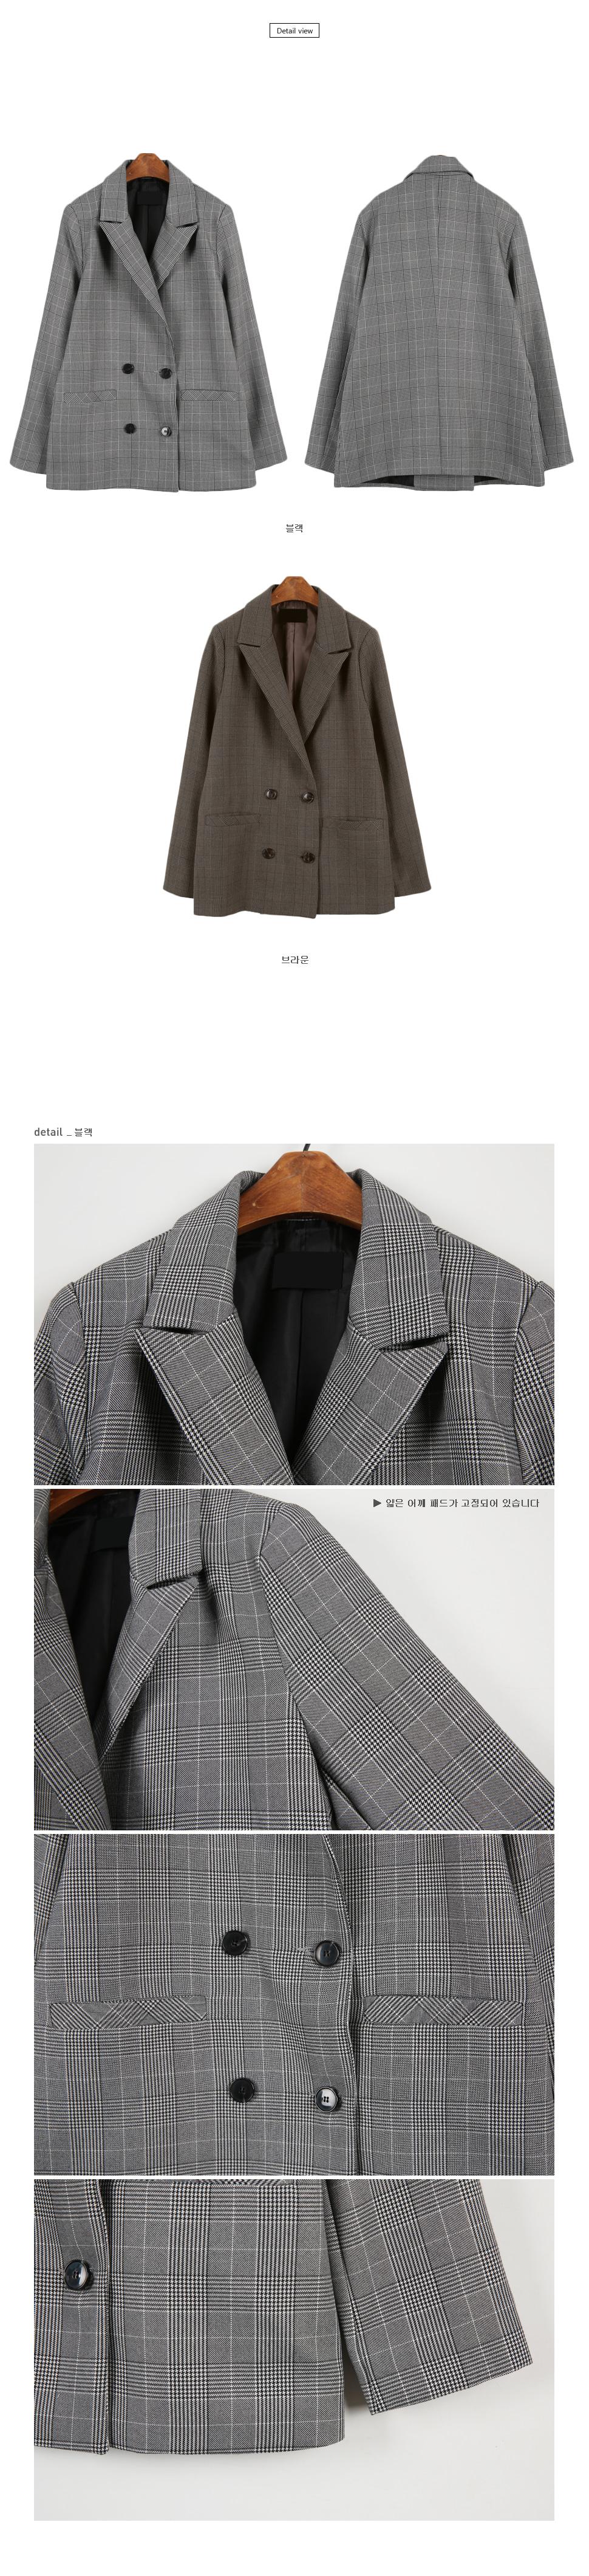 Marble Check Jacket - Black